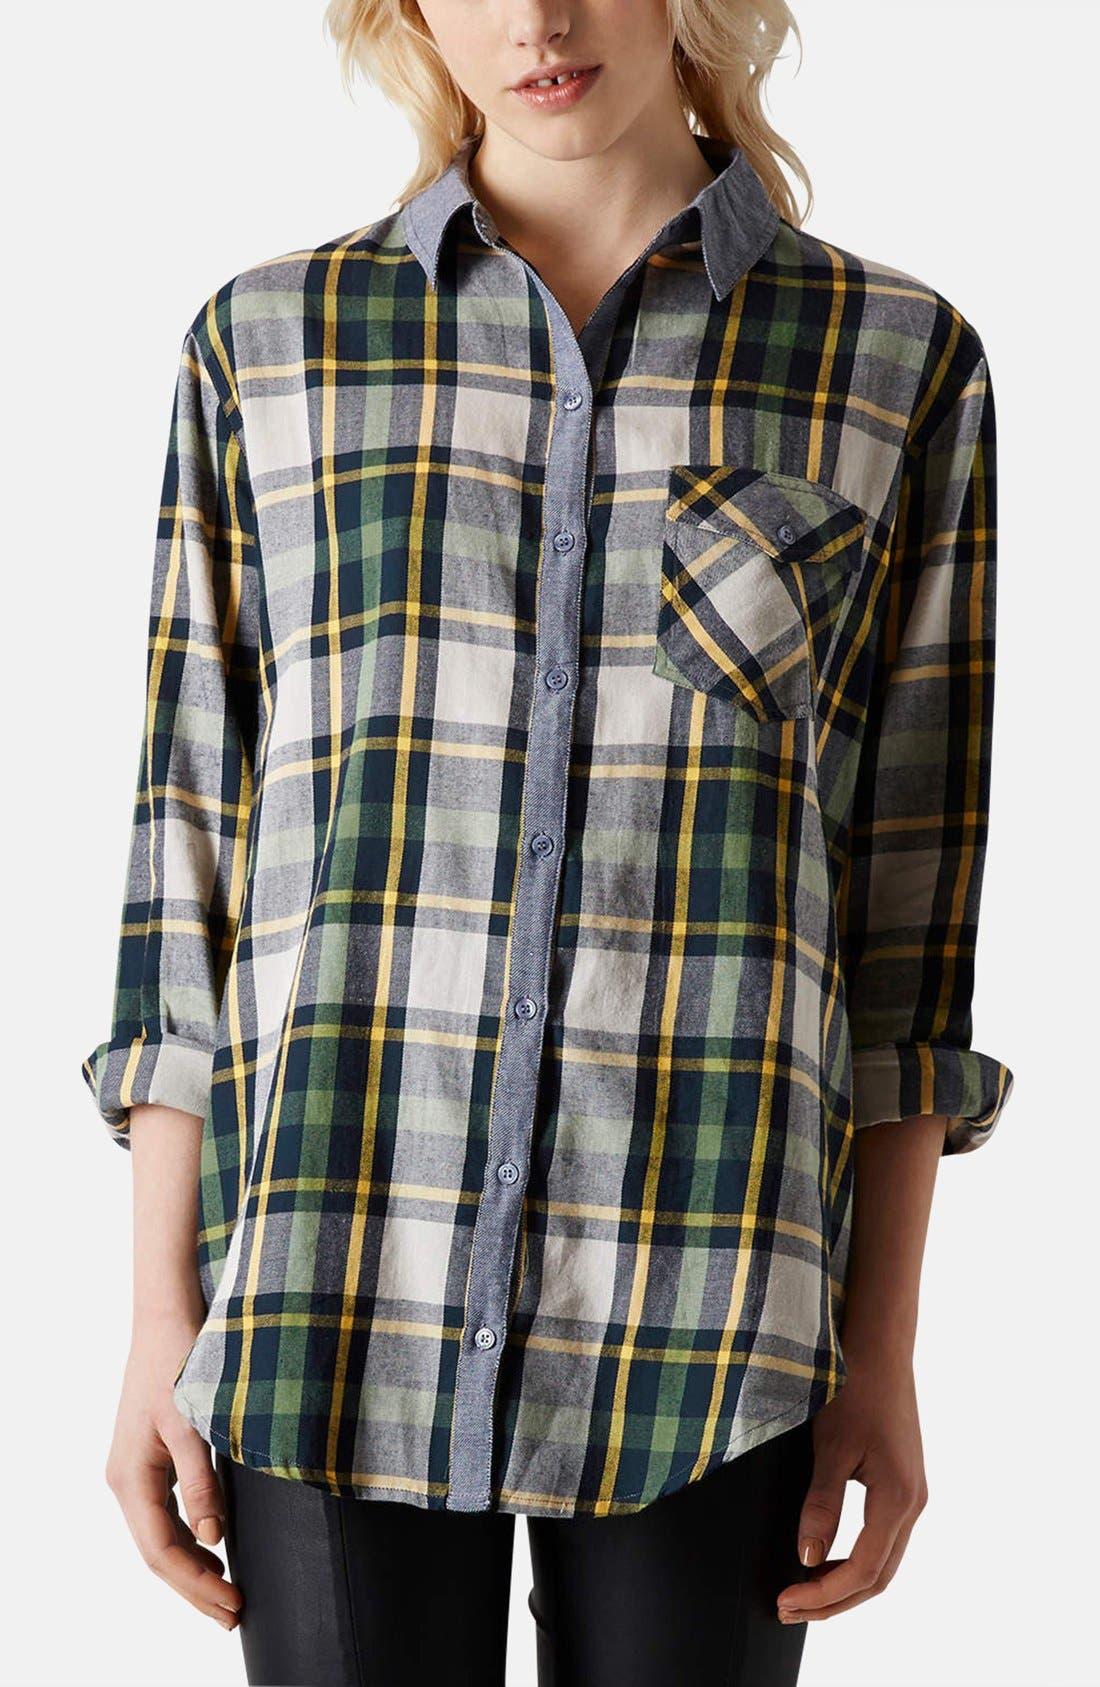 Alternate Image 1 Selected - Topshop 'Marvin' Oversized Plaid Shirt